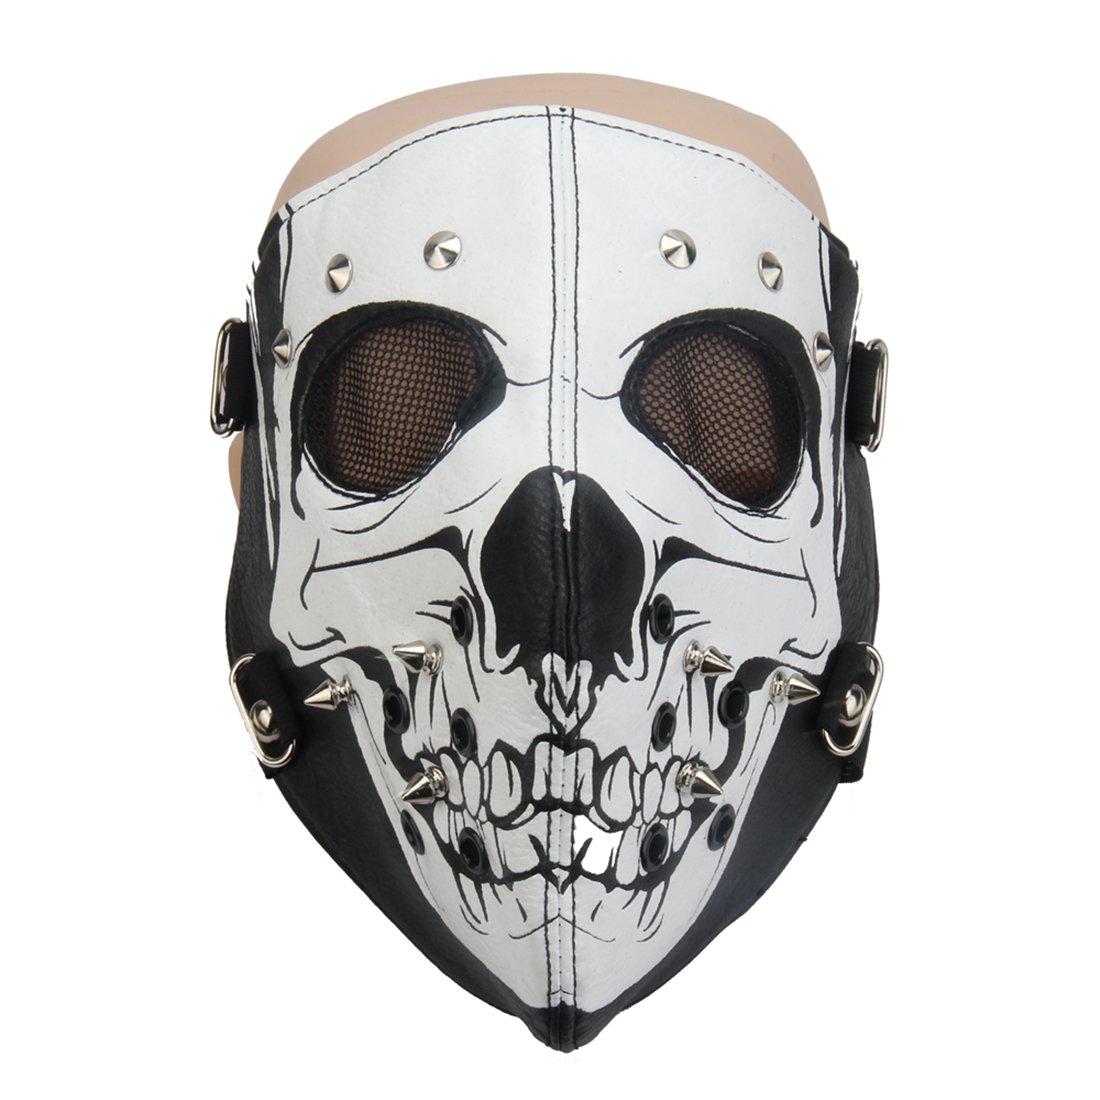 HuiZhi Leather Rivet Skull Riding Mask Punk Half Face Dust Windproof Mask